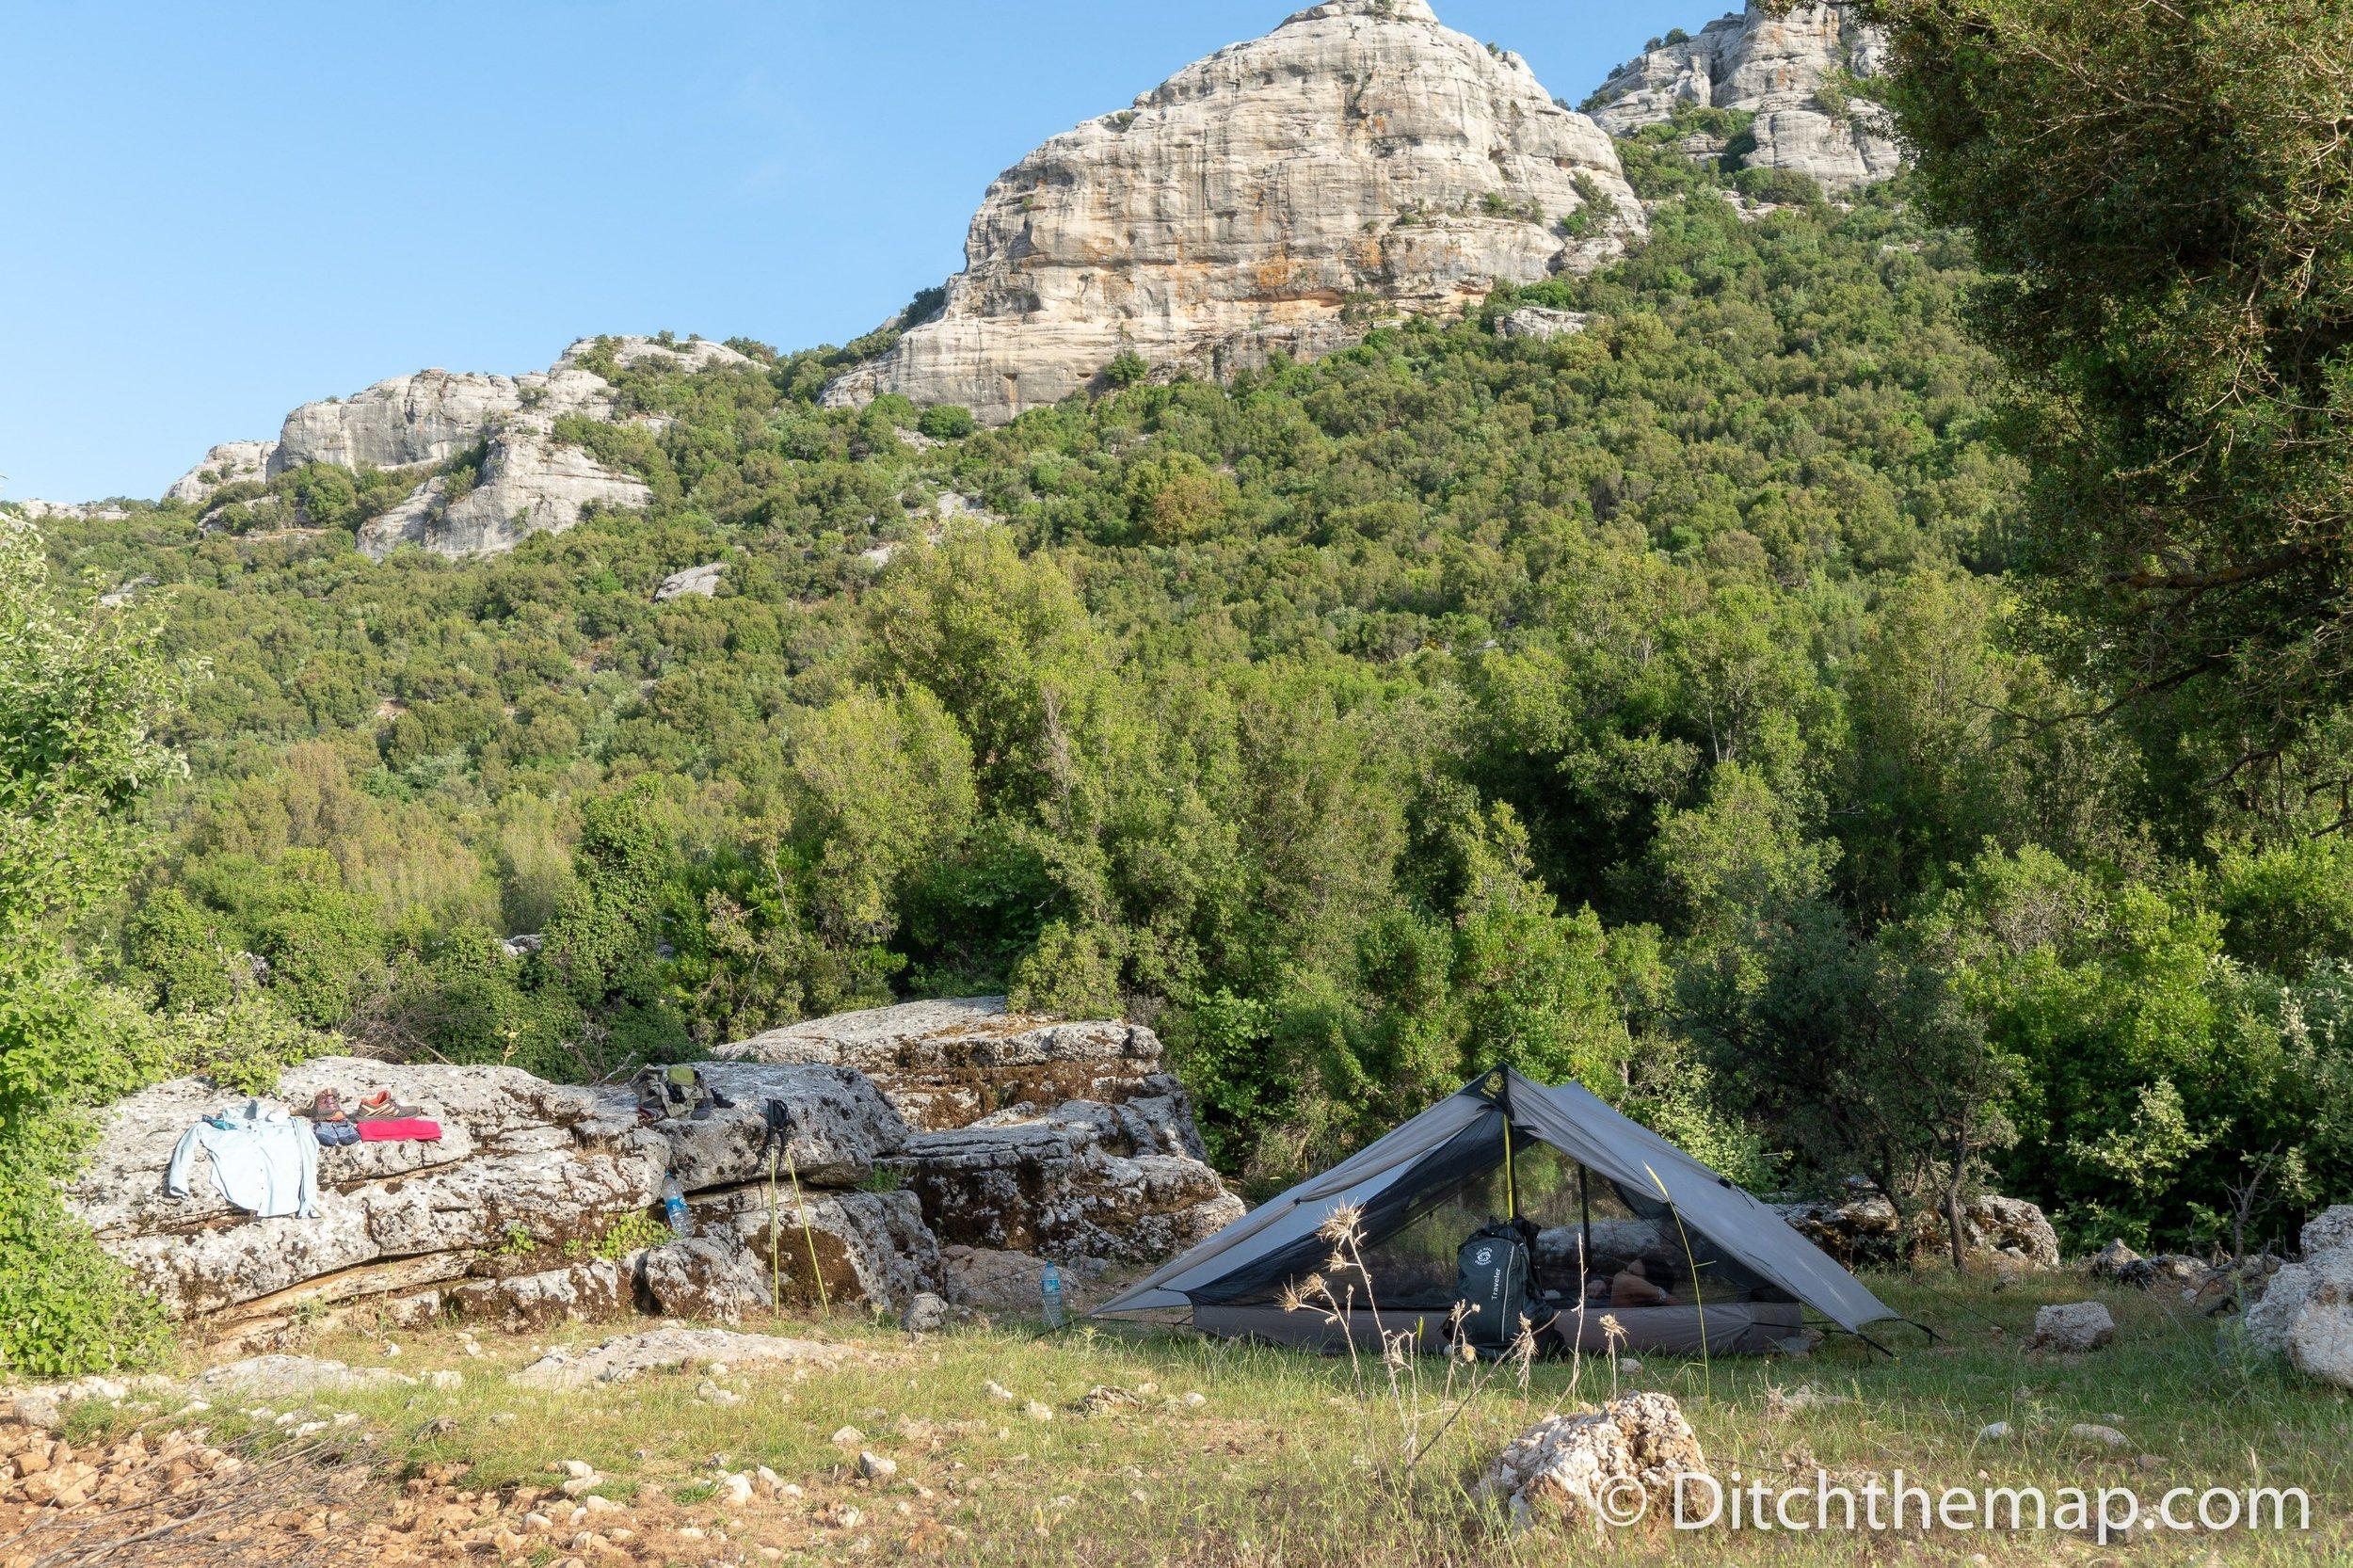 Our camping spot between the villages of Saribelen and Gökçeören